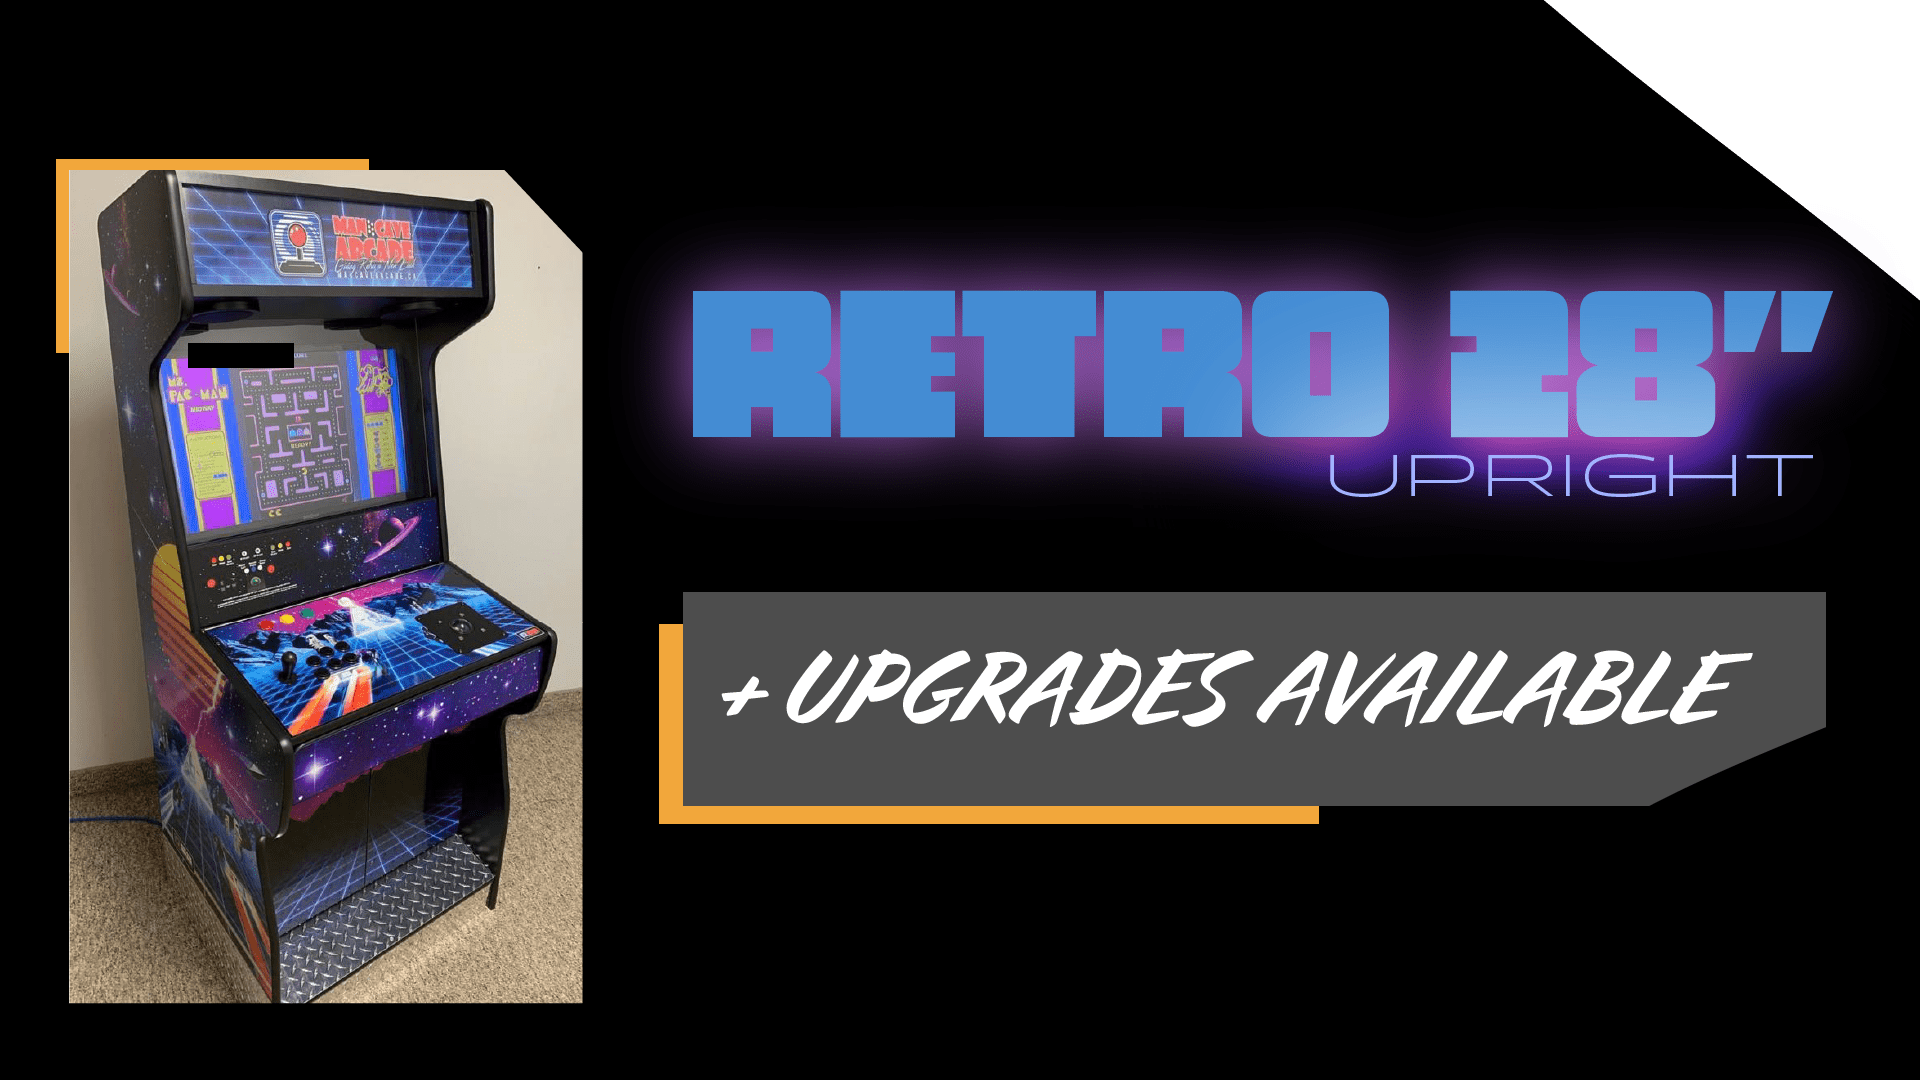 RETRO 28 - product-01